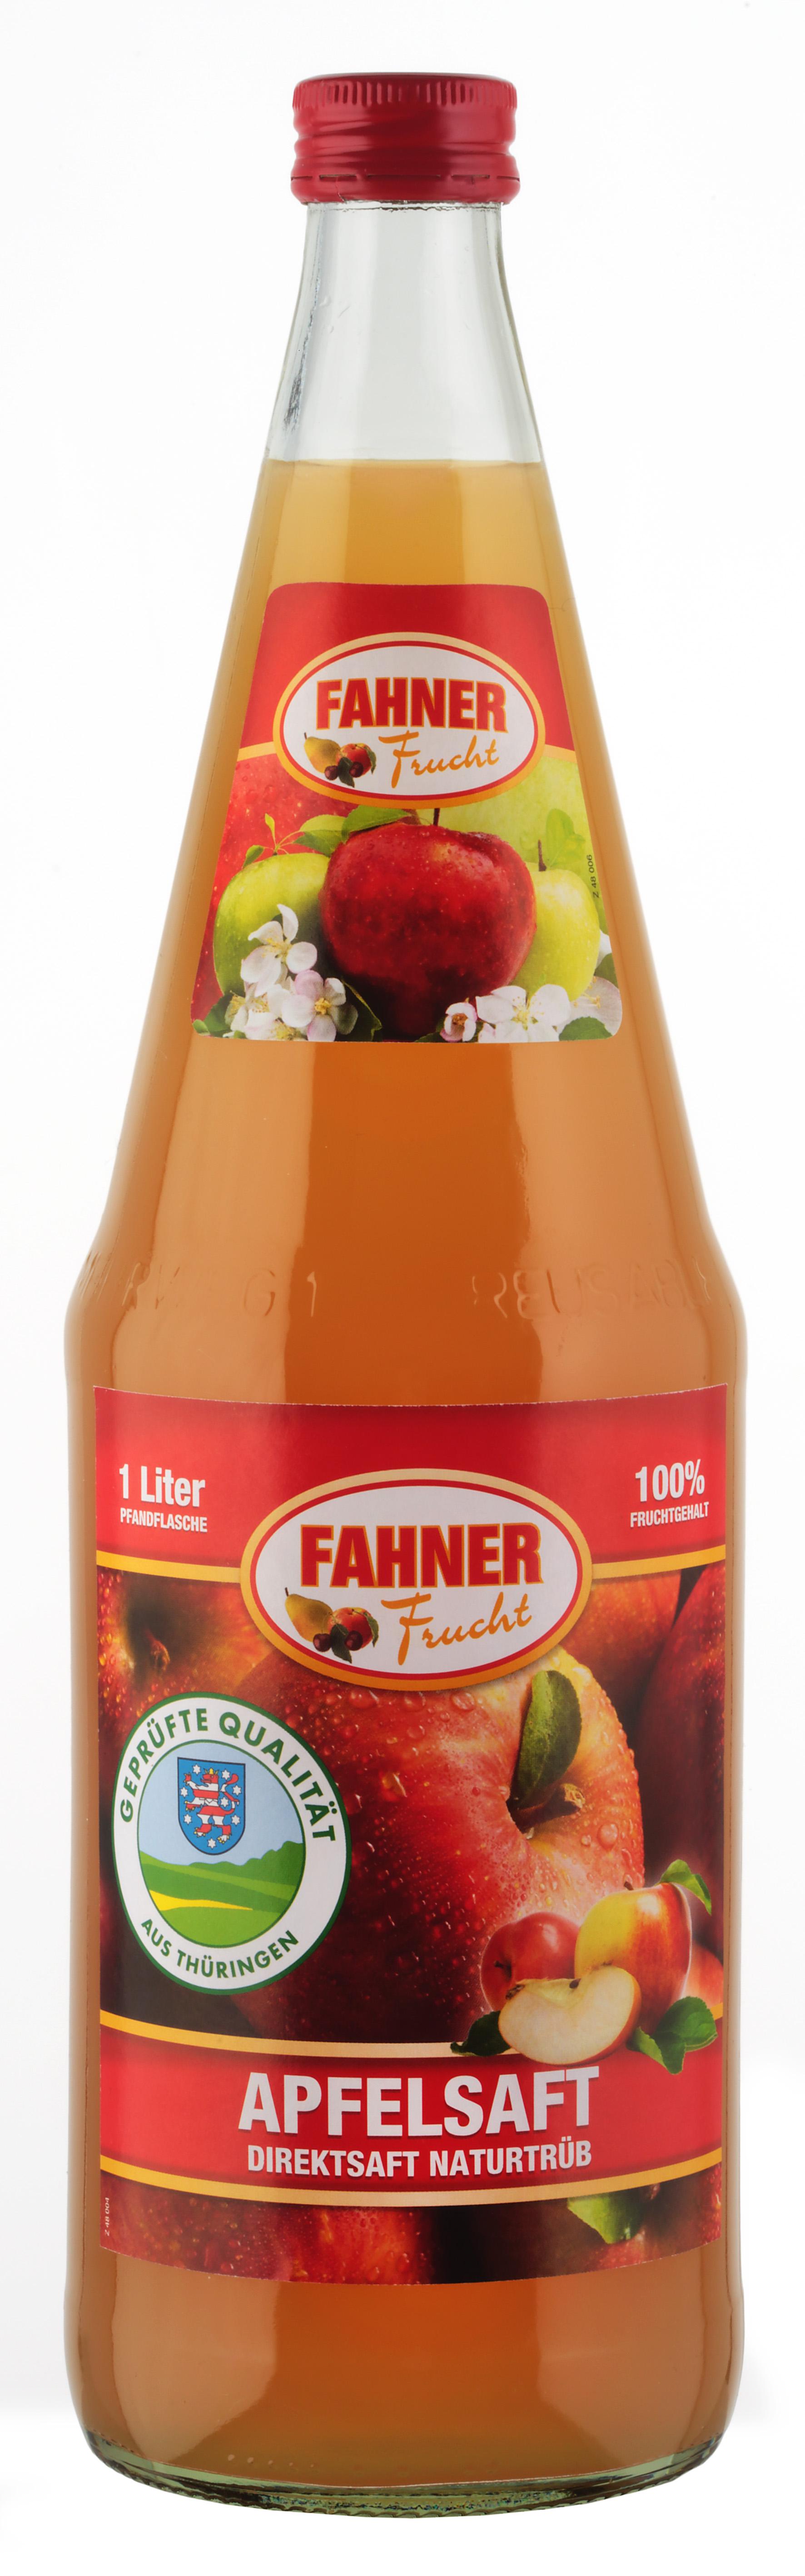 FAHNER Apfelsaft naturtrüb Direktsaft 6x1 l